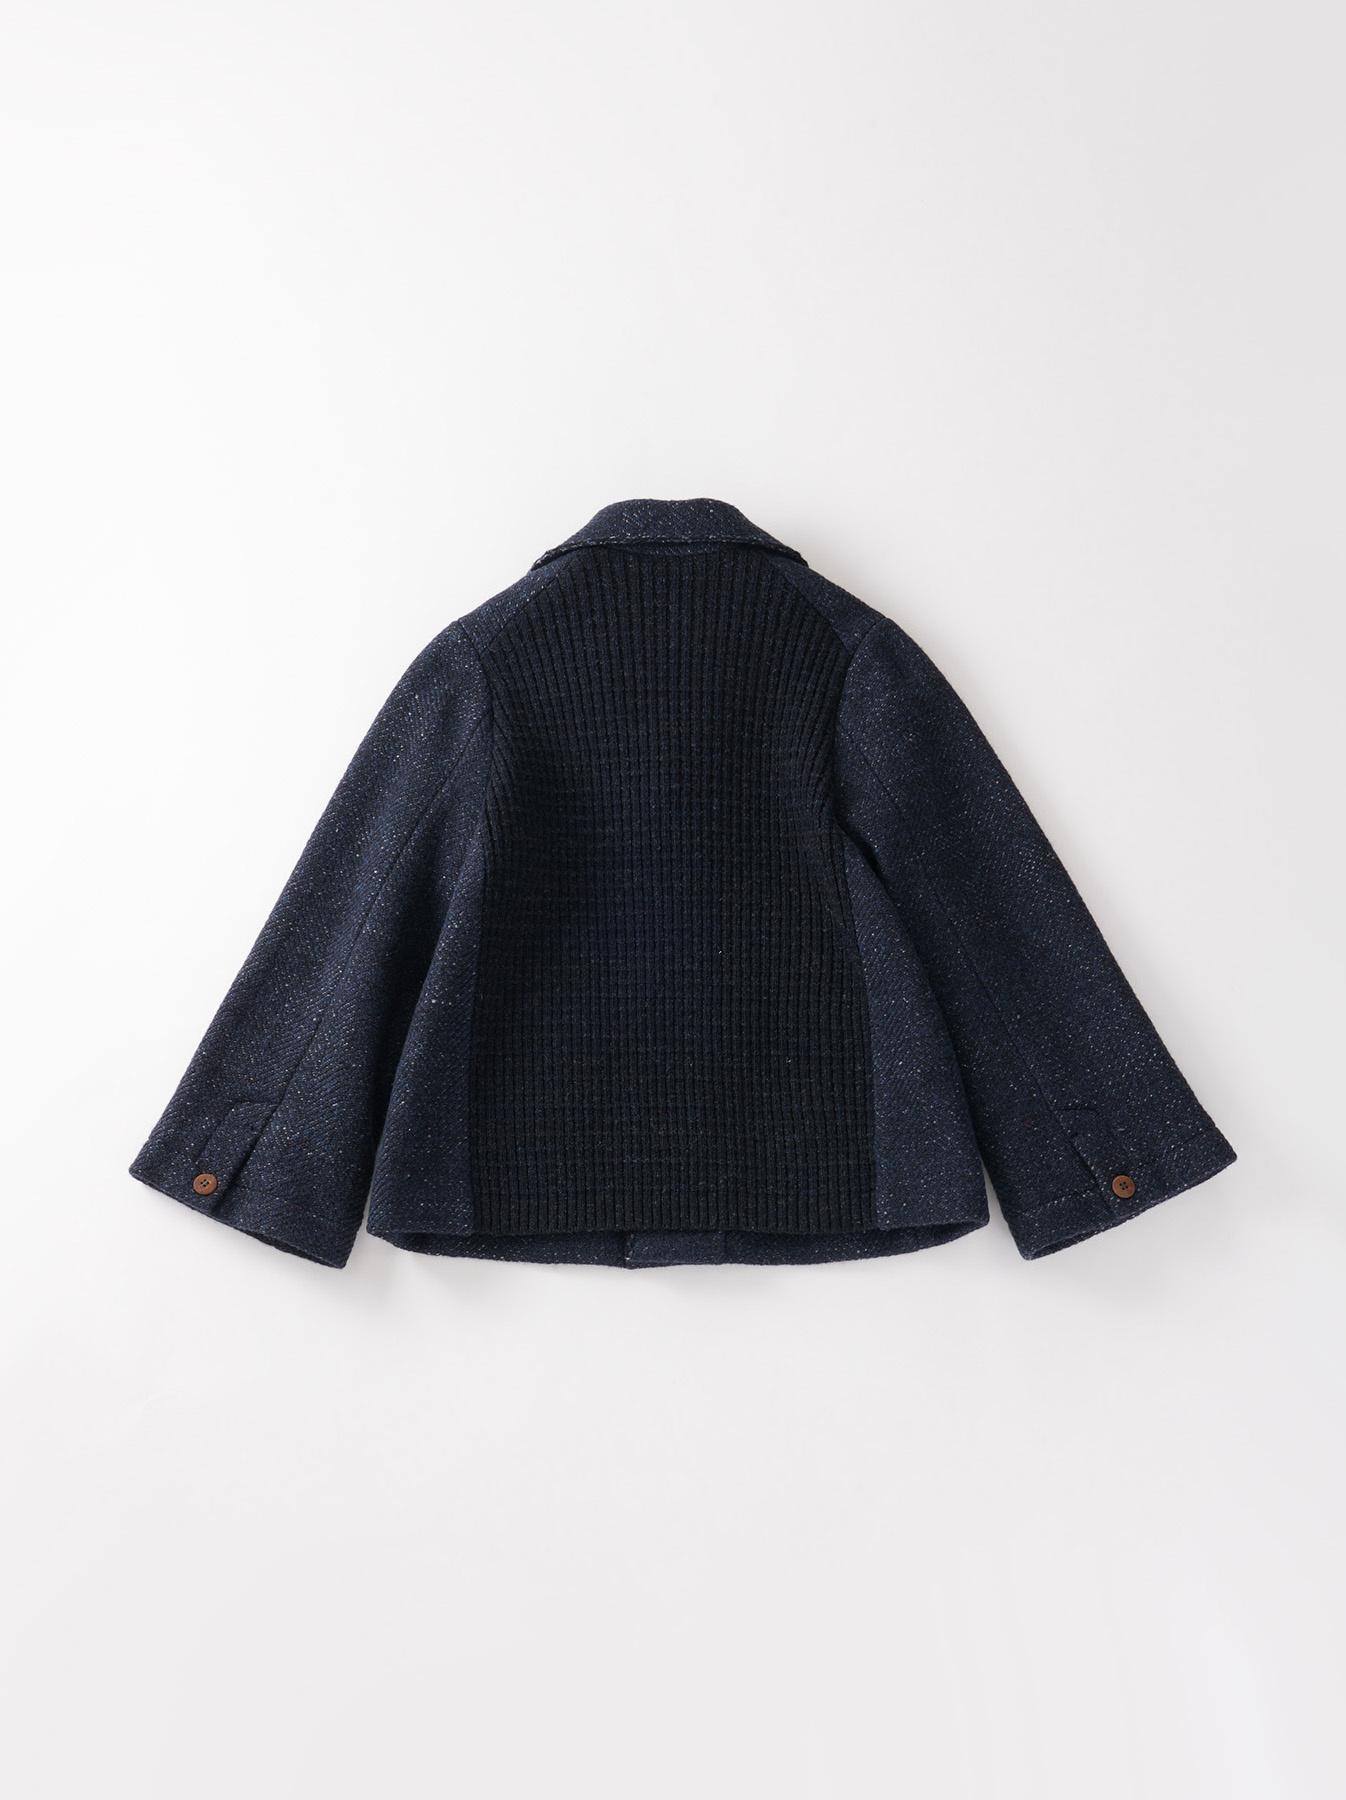 Mixed Tweed Knit Jacket-6